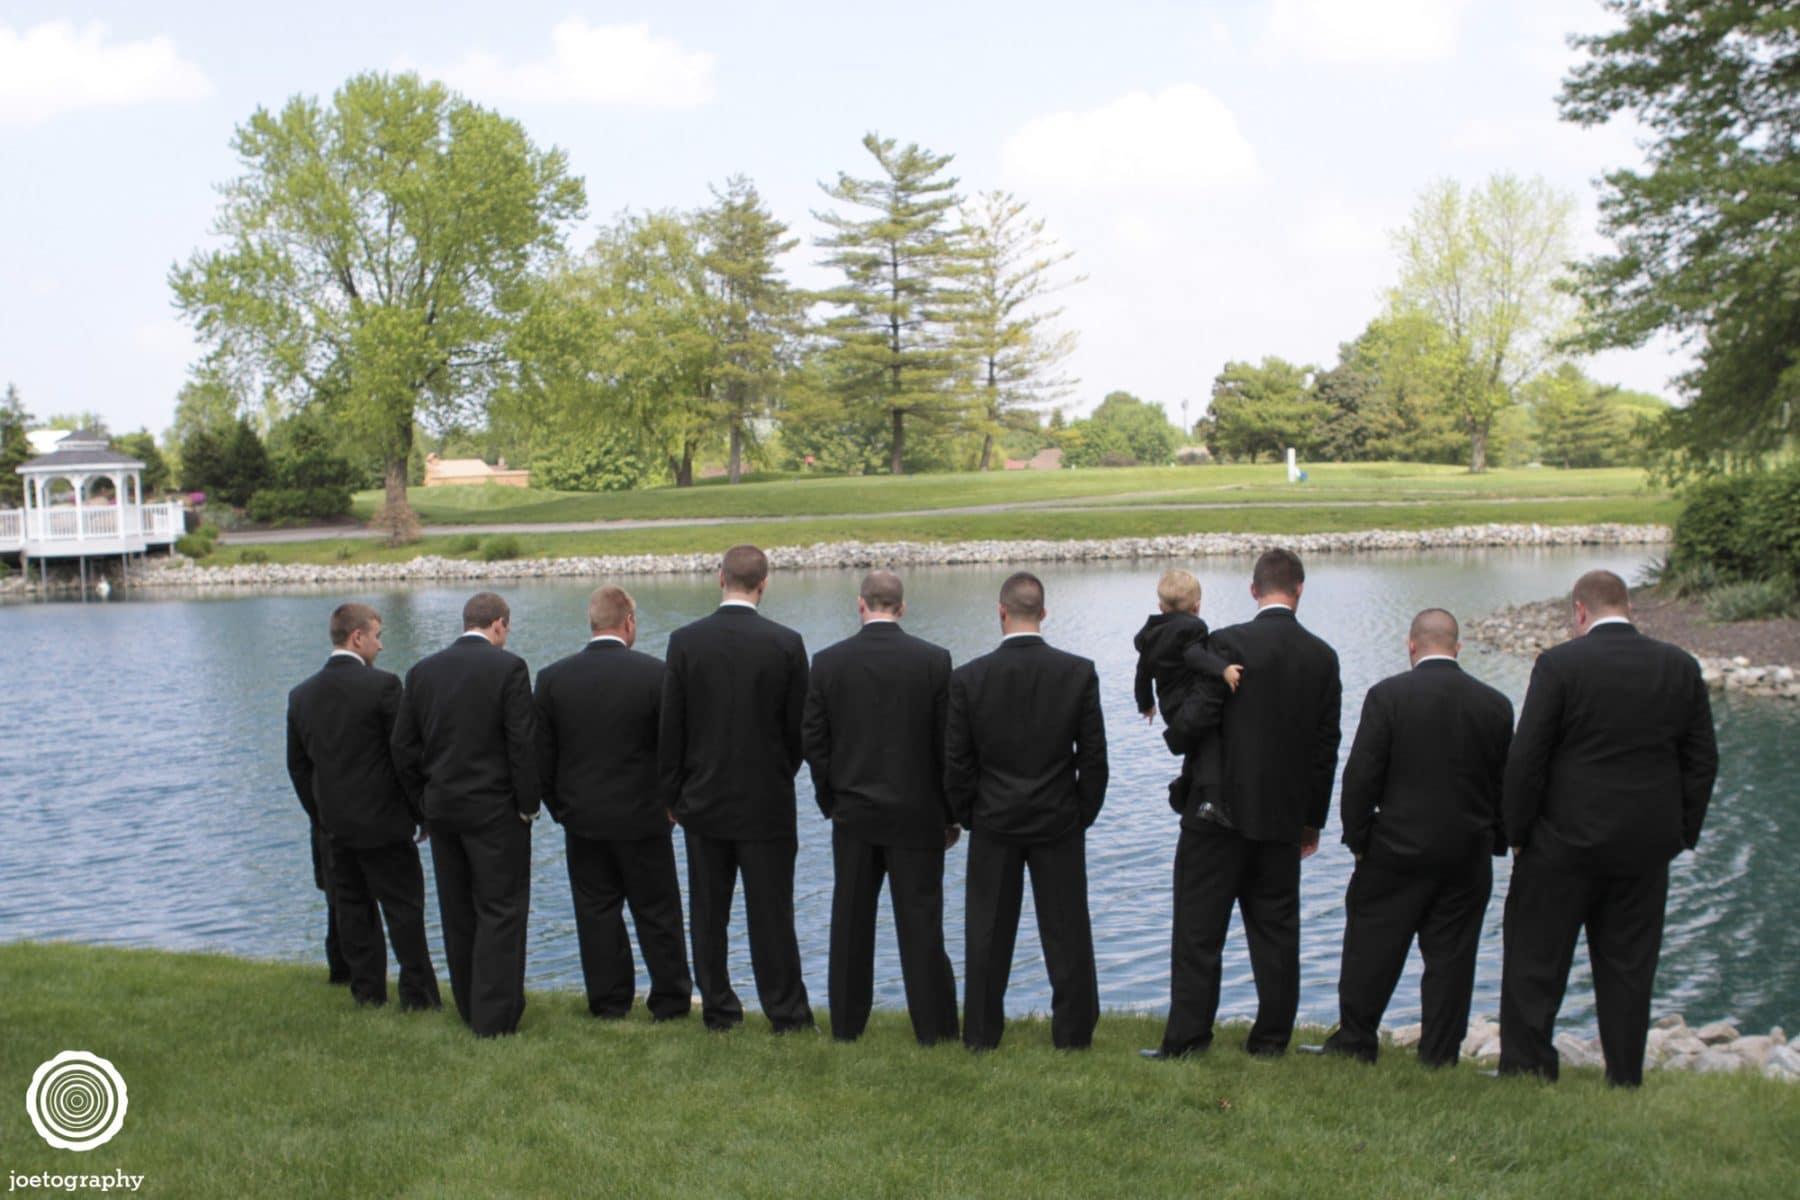 Toon-Wedding-Photographer-Greenwood-Indiana-11